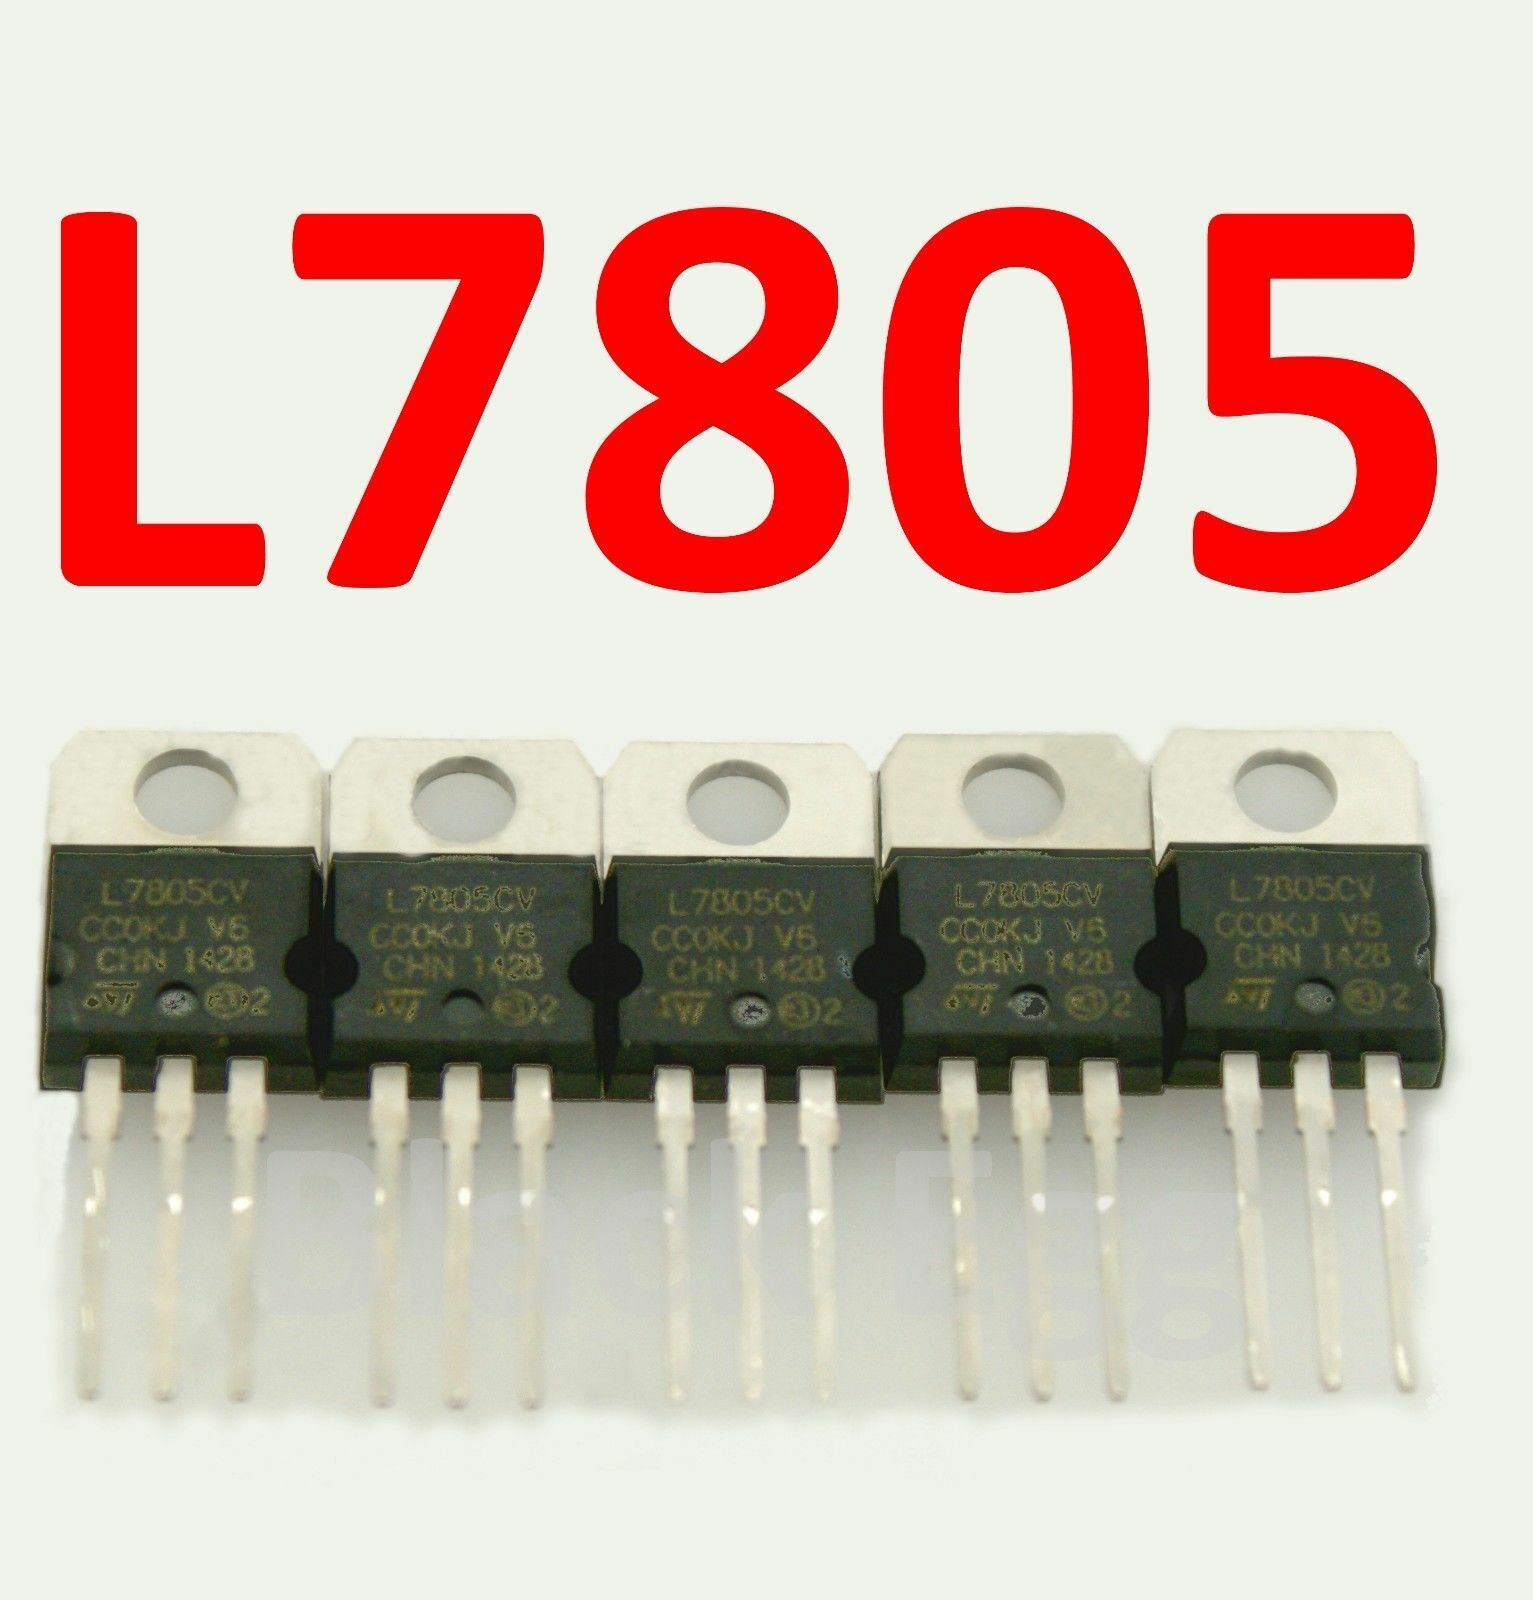 10Pcs IC L7805CV L7805 TO-220 5V Voltage Regulator Po Jf